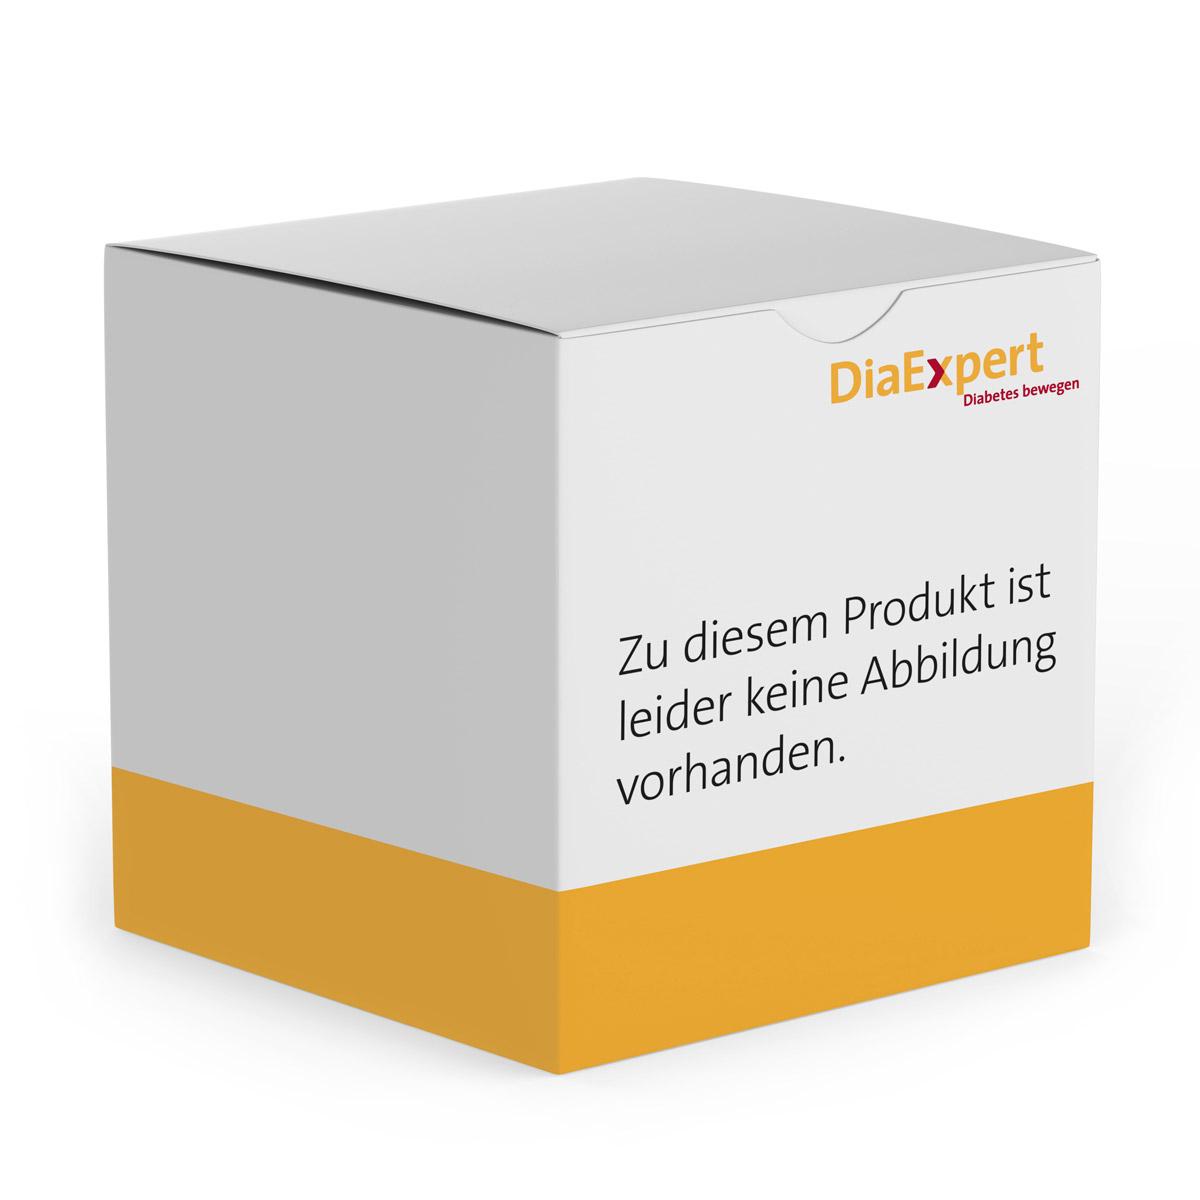 Reservoir-Pak 1,8 ml (inkl. 4 Batterien) für MiniMed 5er Serie Inhalt: 20 Stück